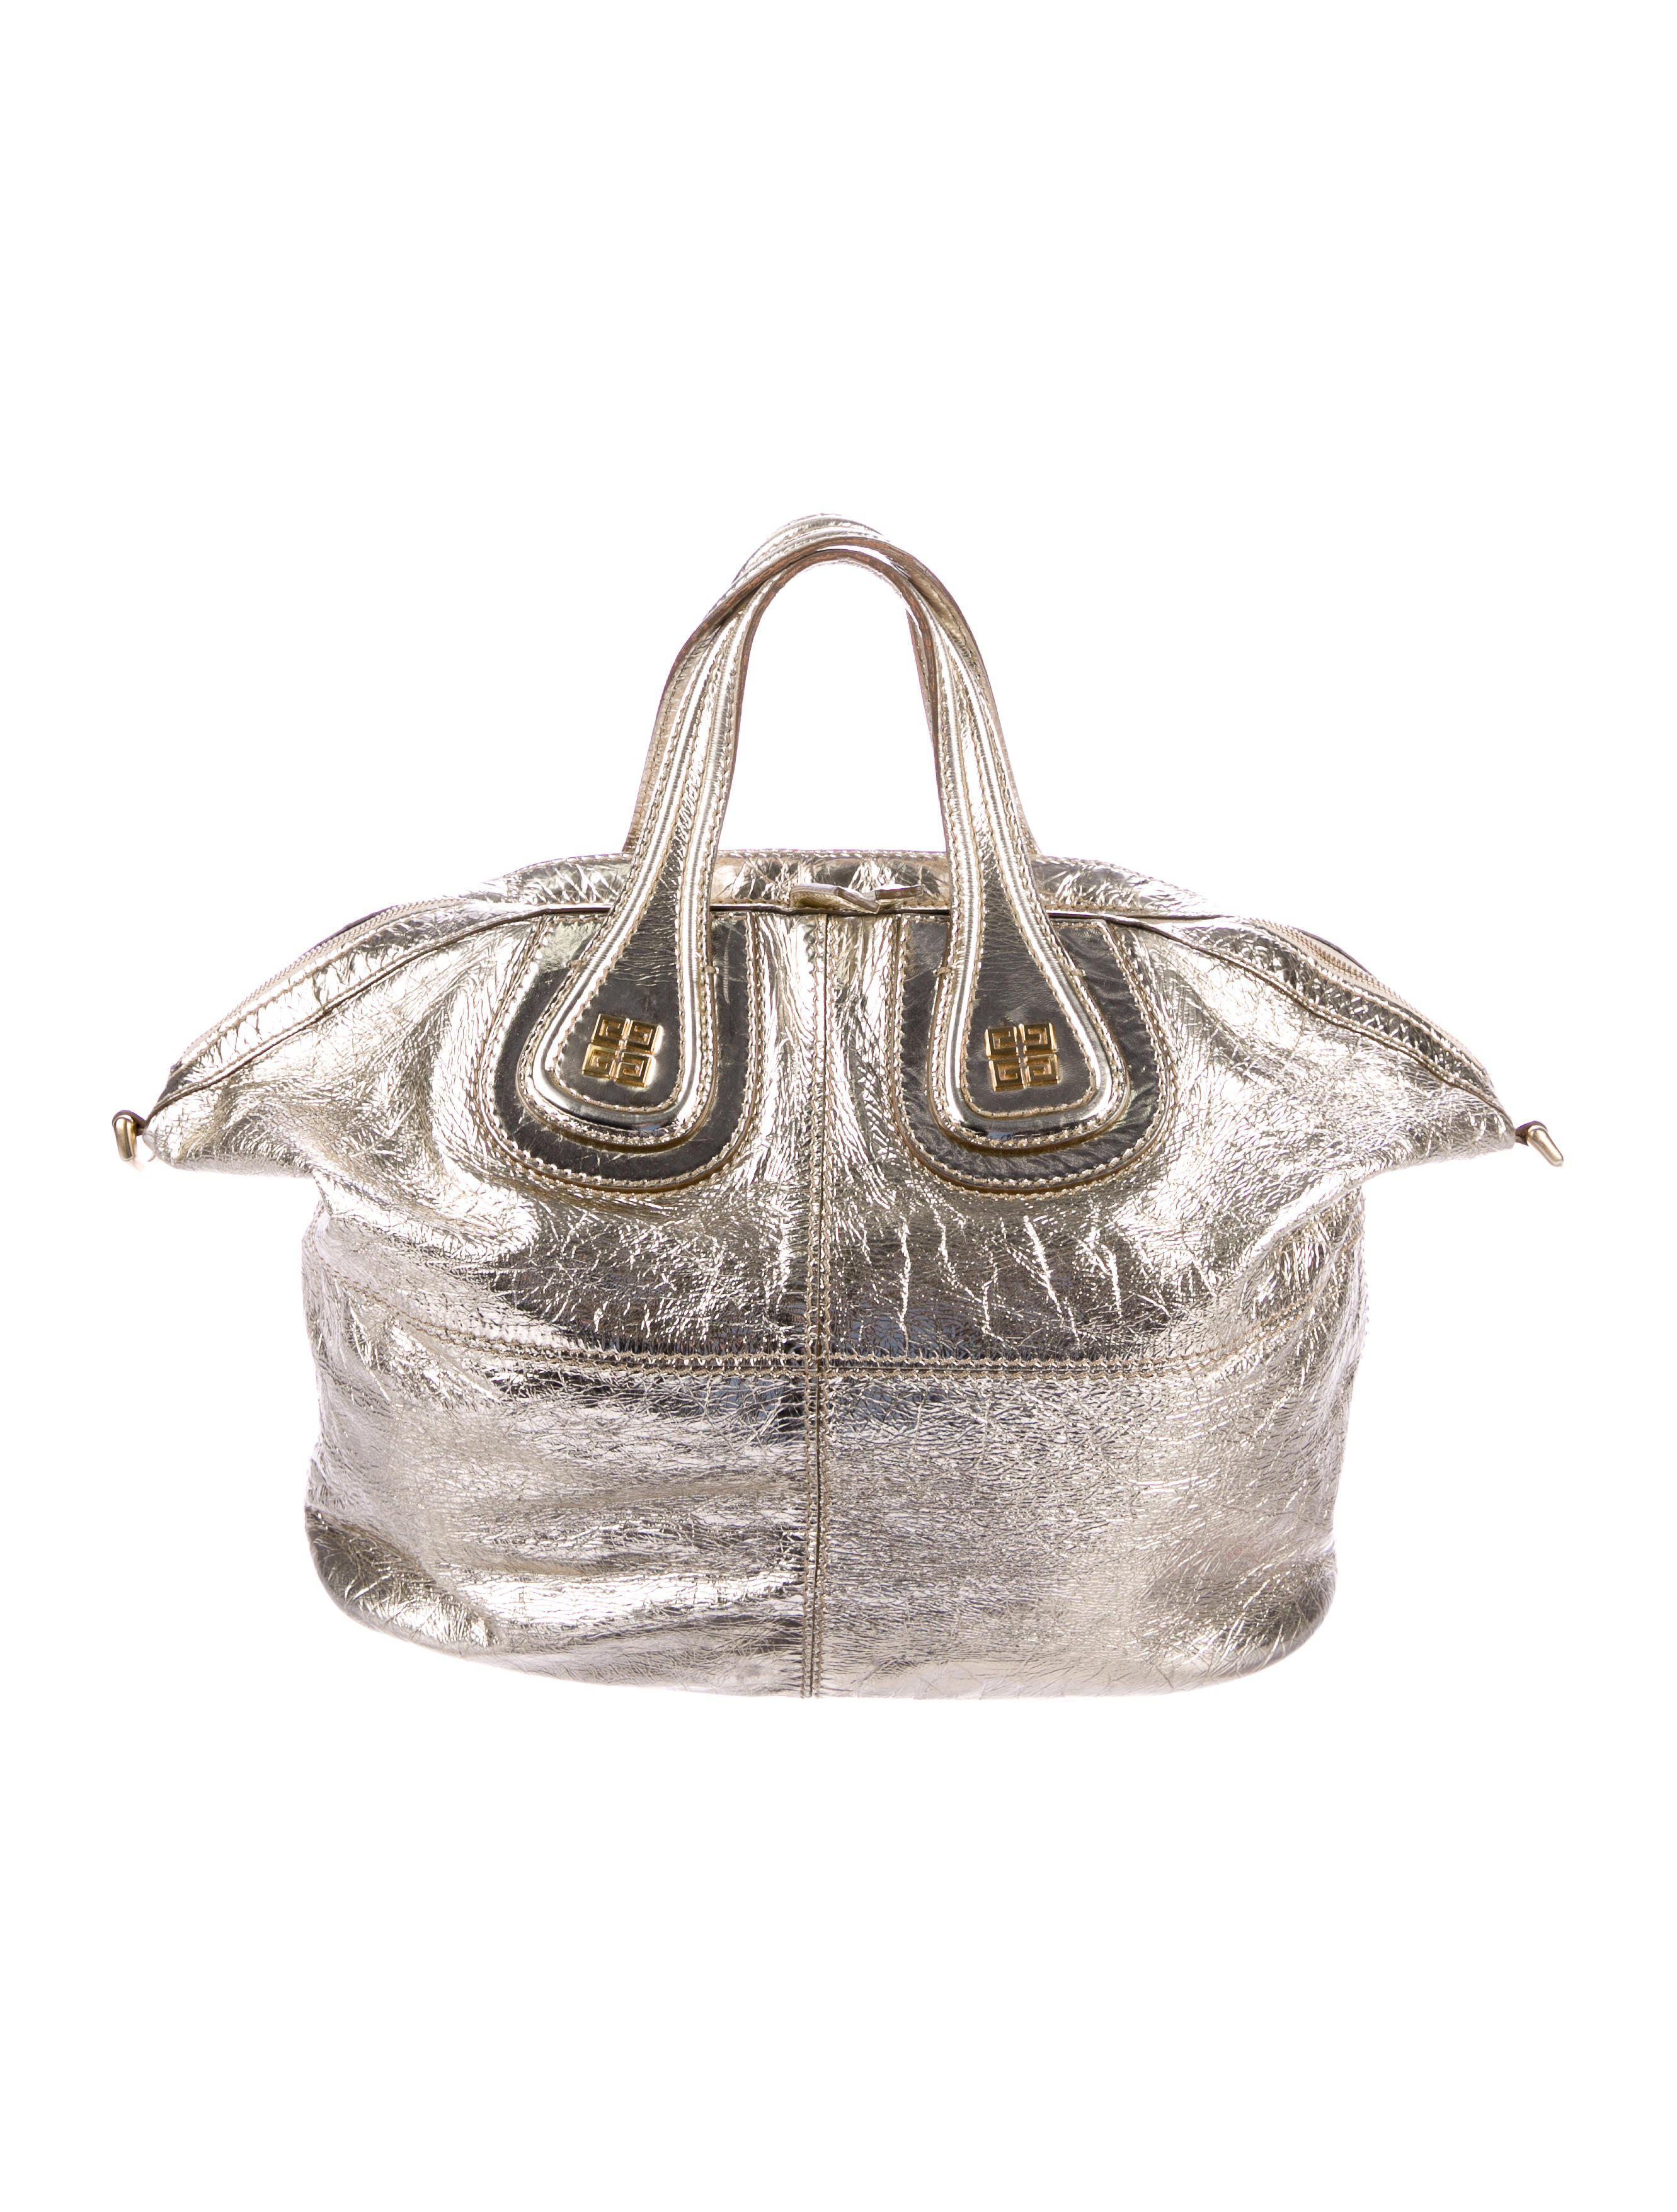 805f9deb32 Lyst - Givenchy Distressed Leather Antigona Satchel Gold in Metallic